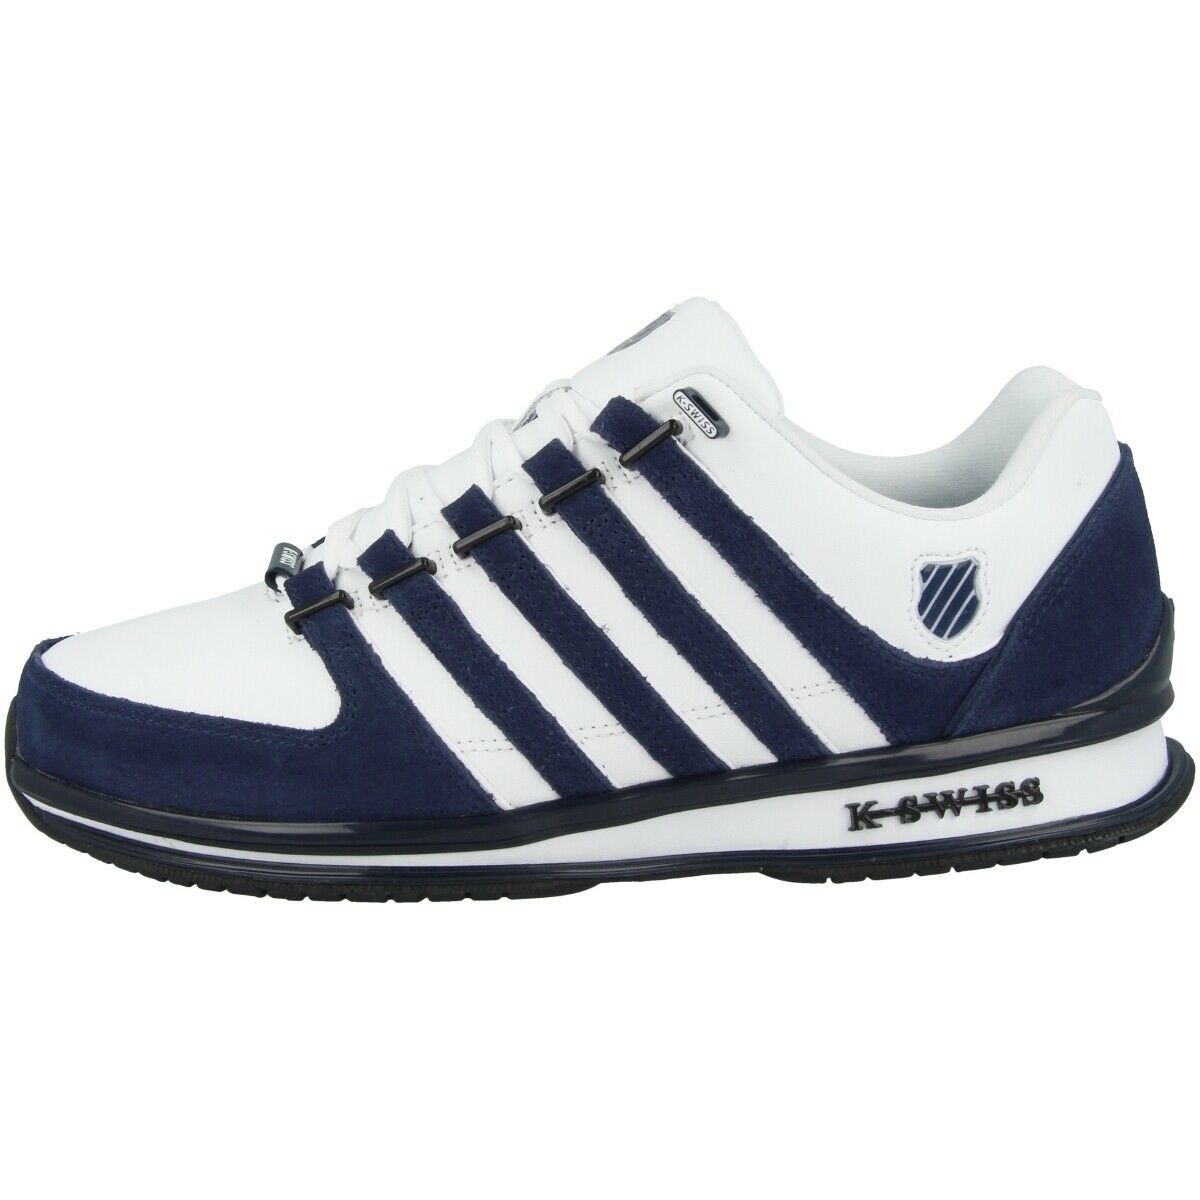 K-Swiss Rinzler SP Scarpe Tempo Libero scarpe da ginnastica in Pelle bianca Navy nero 02283-915